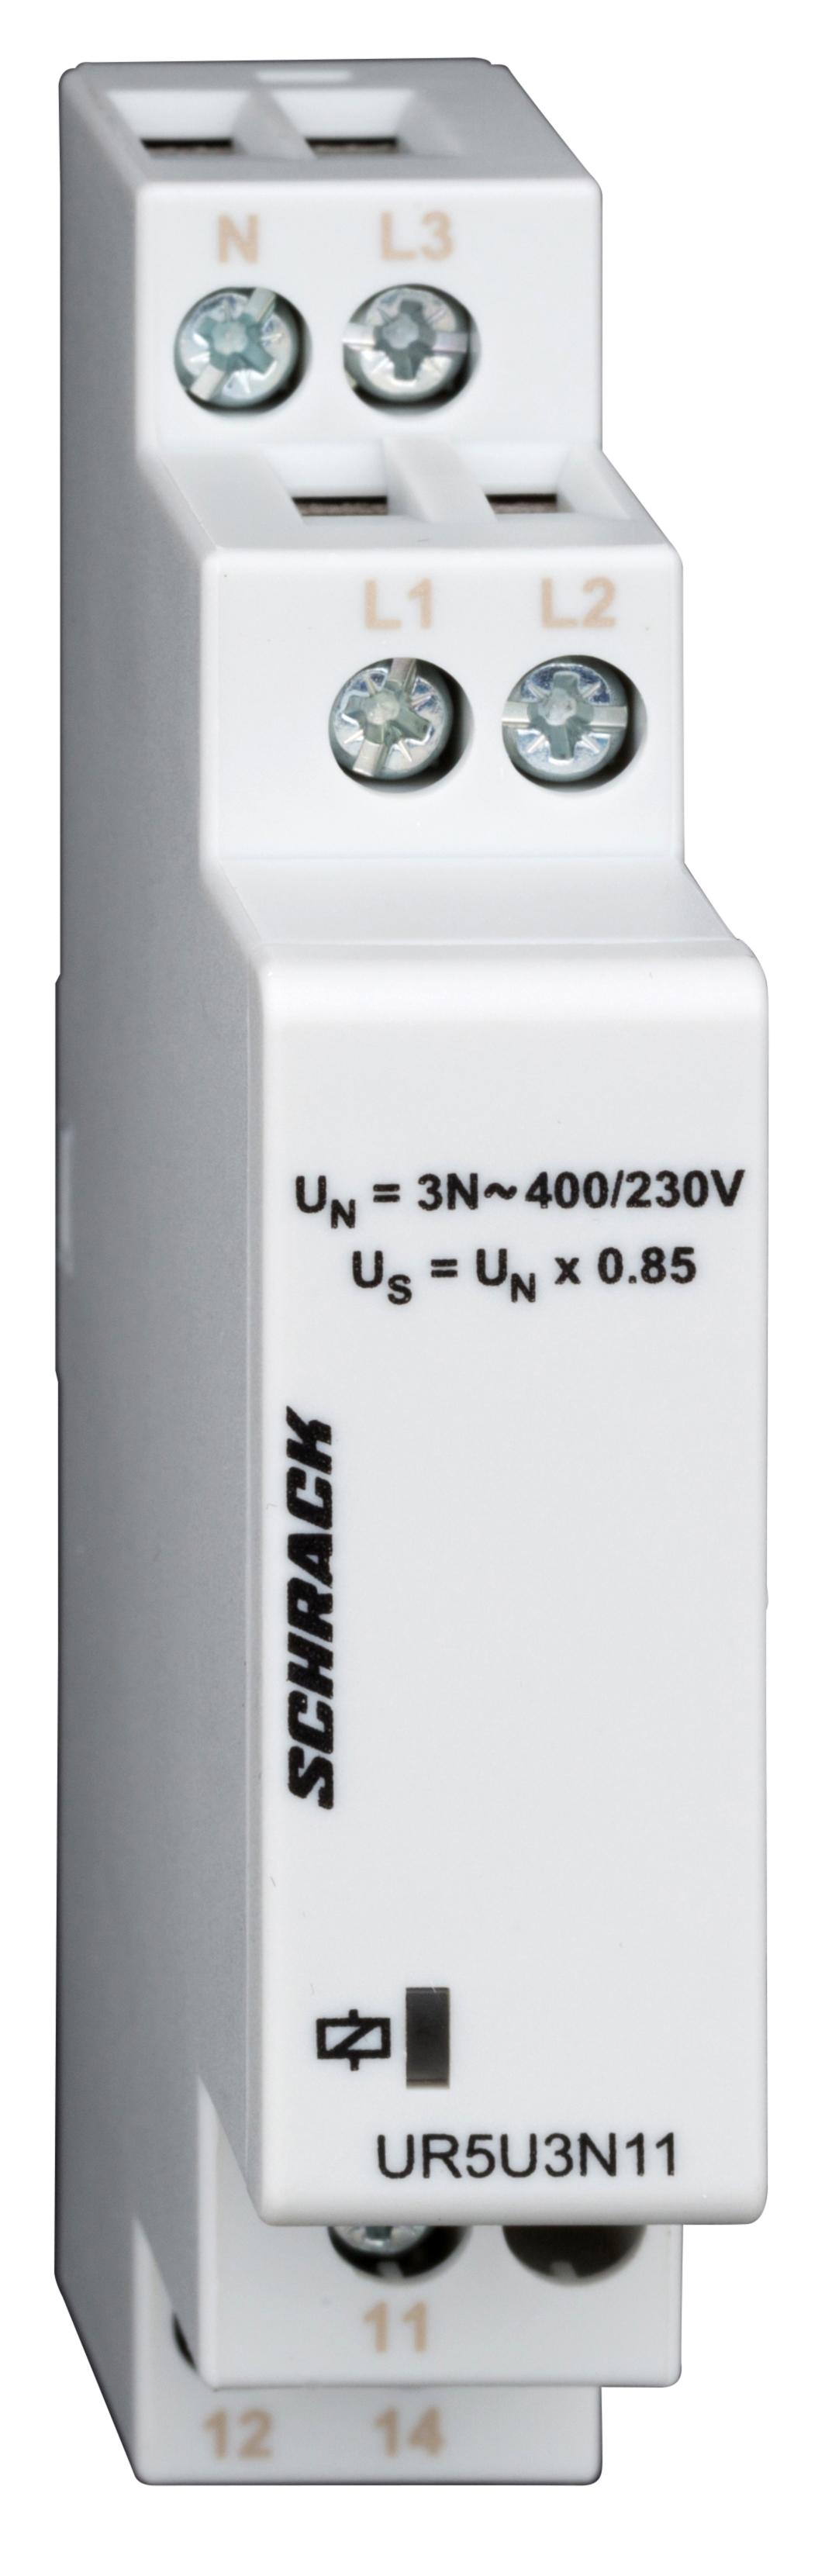 1 Stk Spannungsüberwachung 3-phasig gegen N, fixe Us=195,5V UR5U3N11--